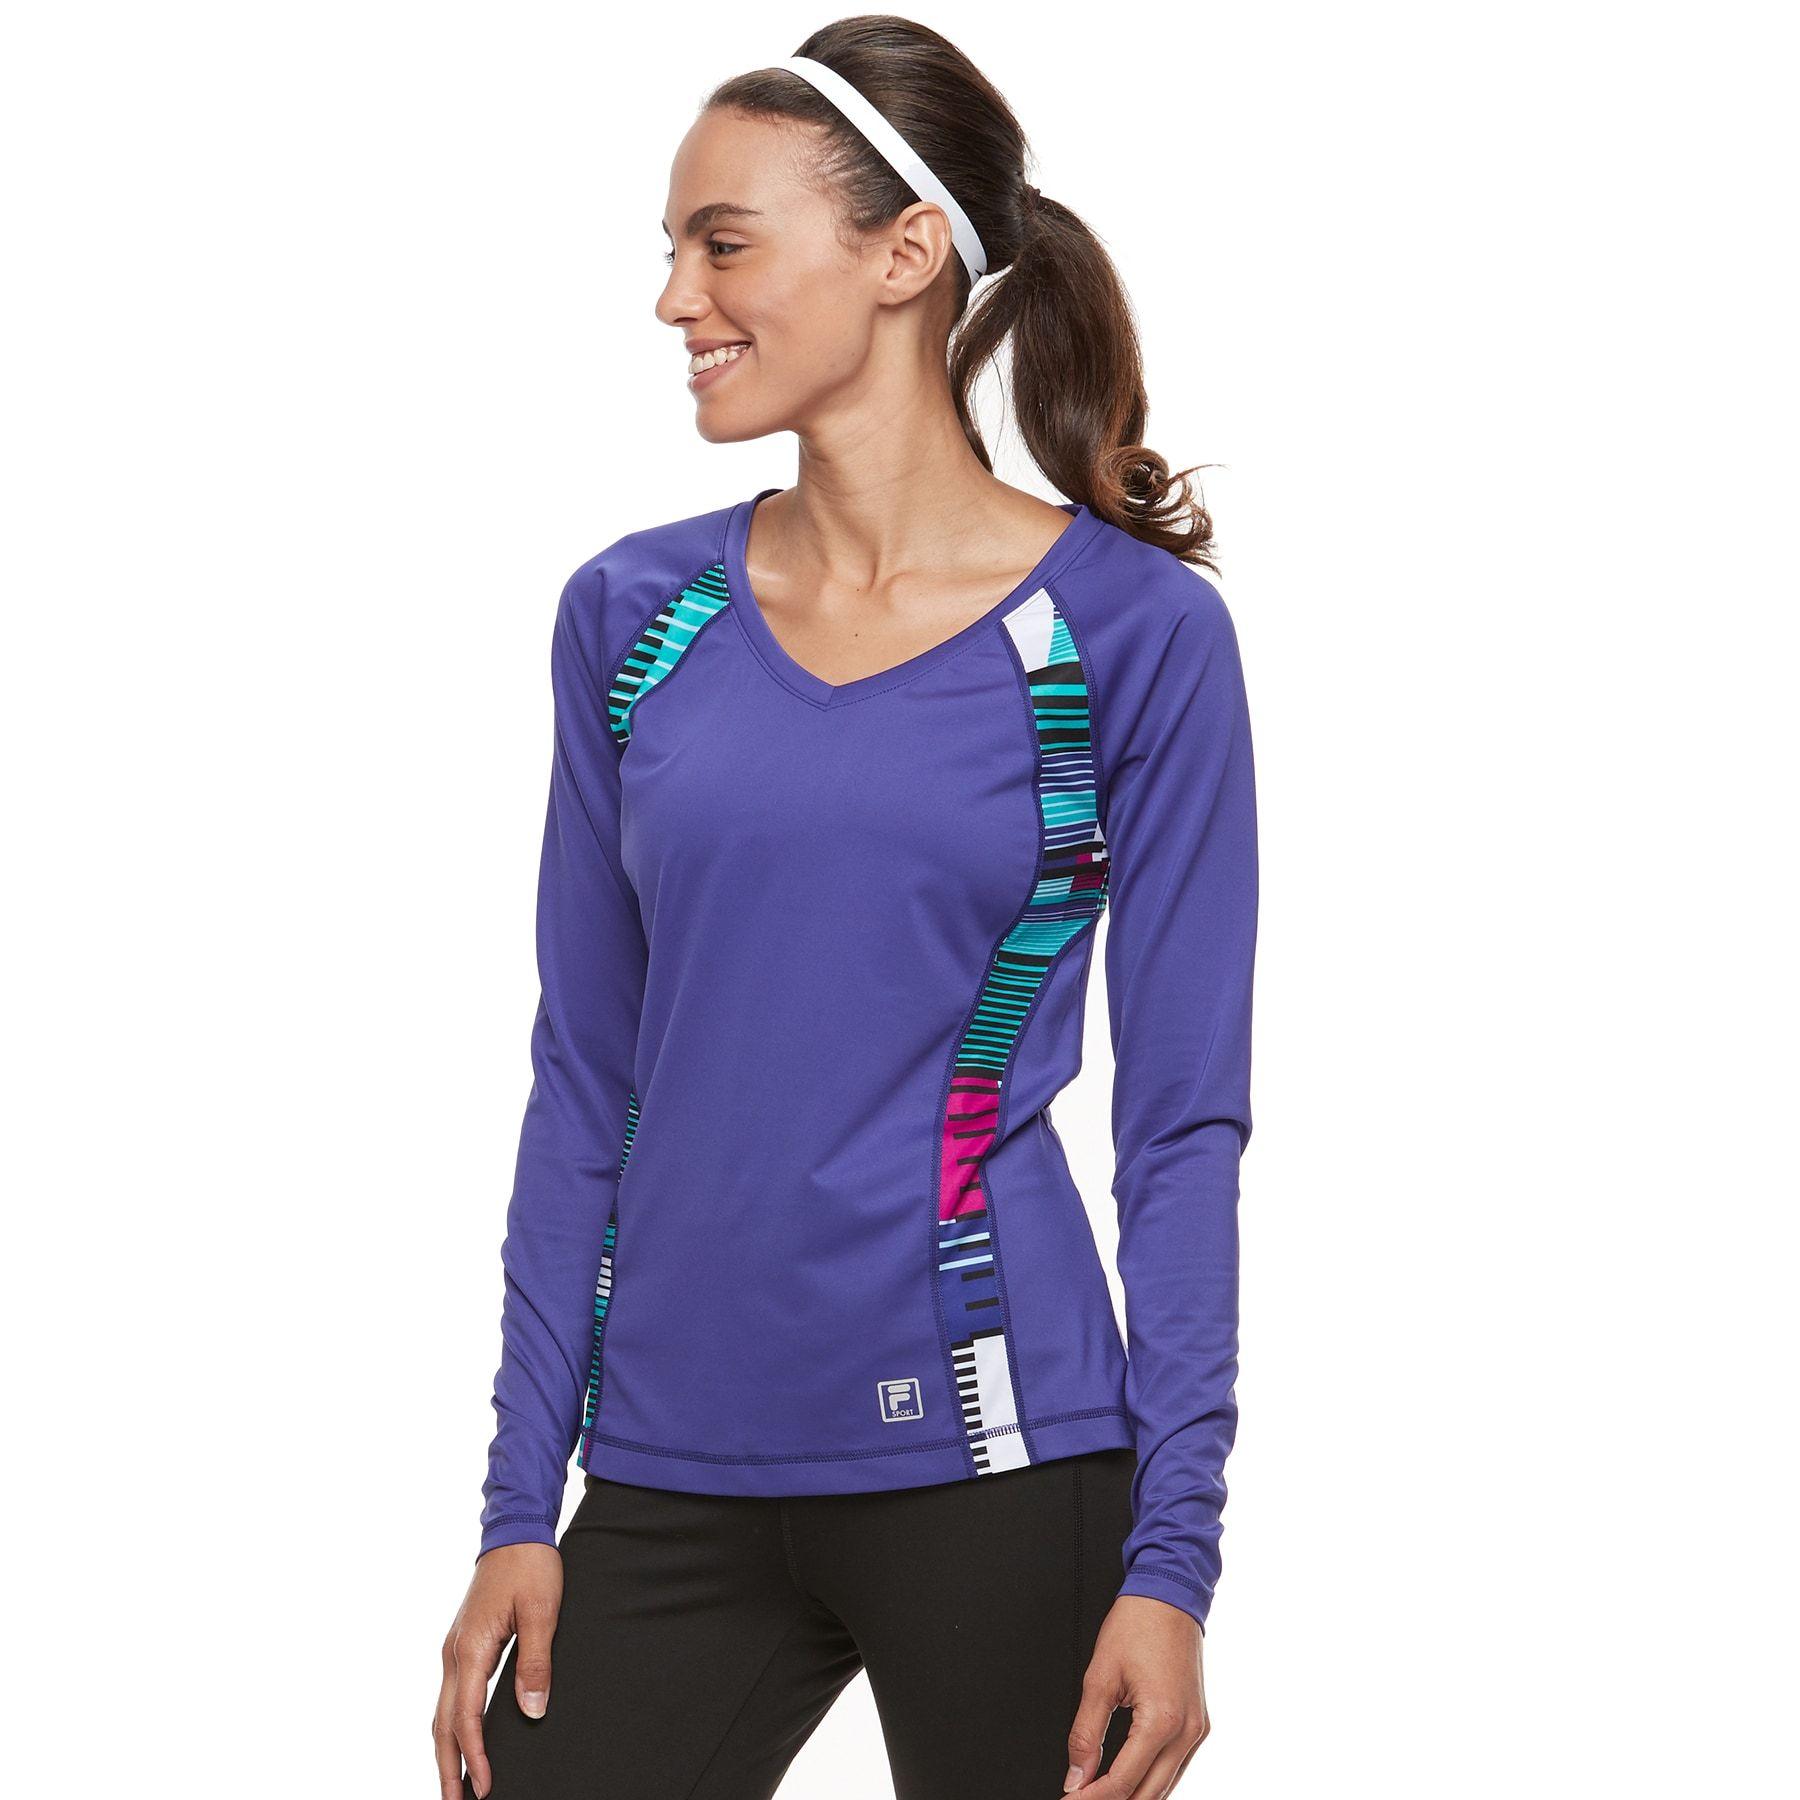 9a666f2e Women's FILA SPORT® V-Neck Long Sleeve Tee in Tori Purple Matrix ...